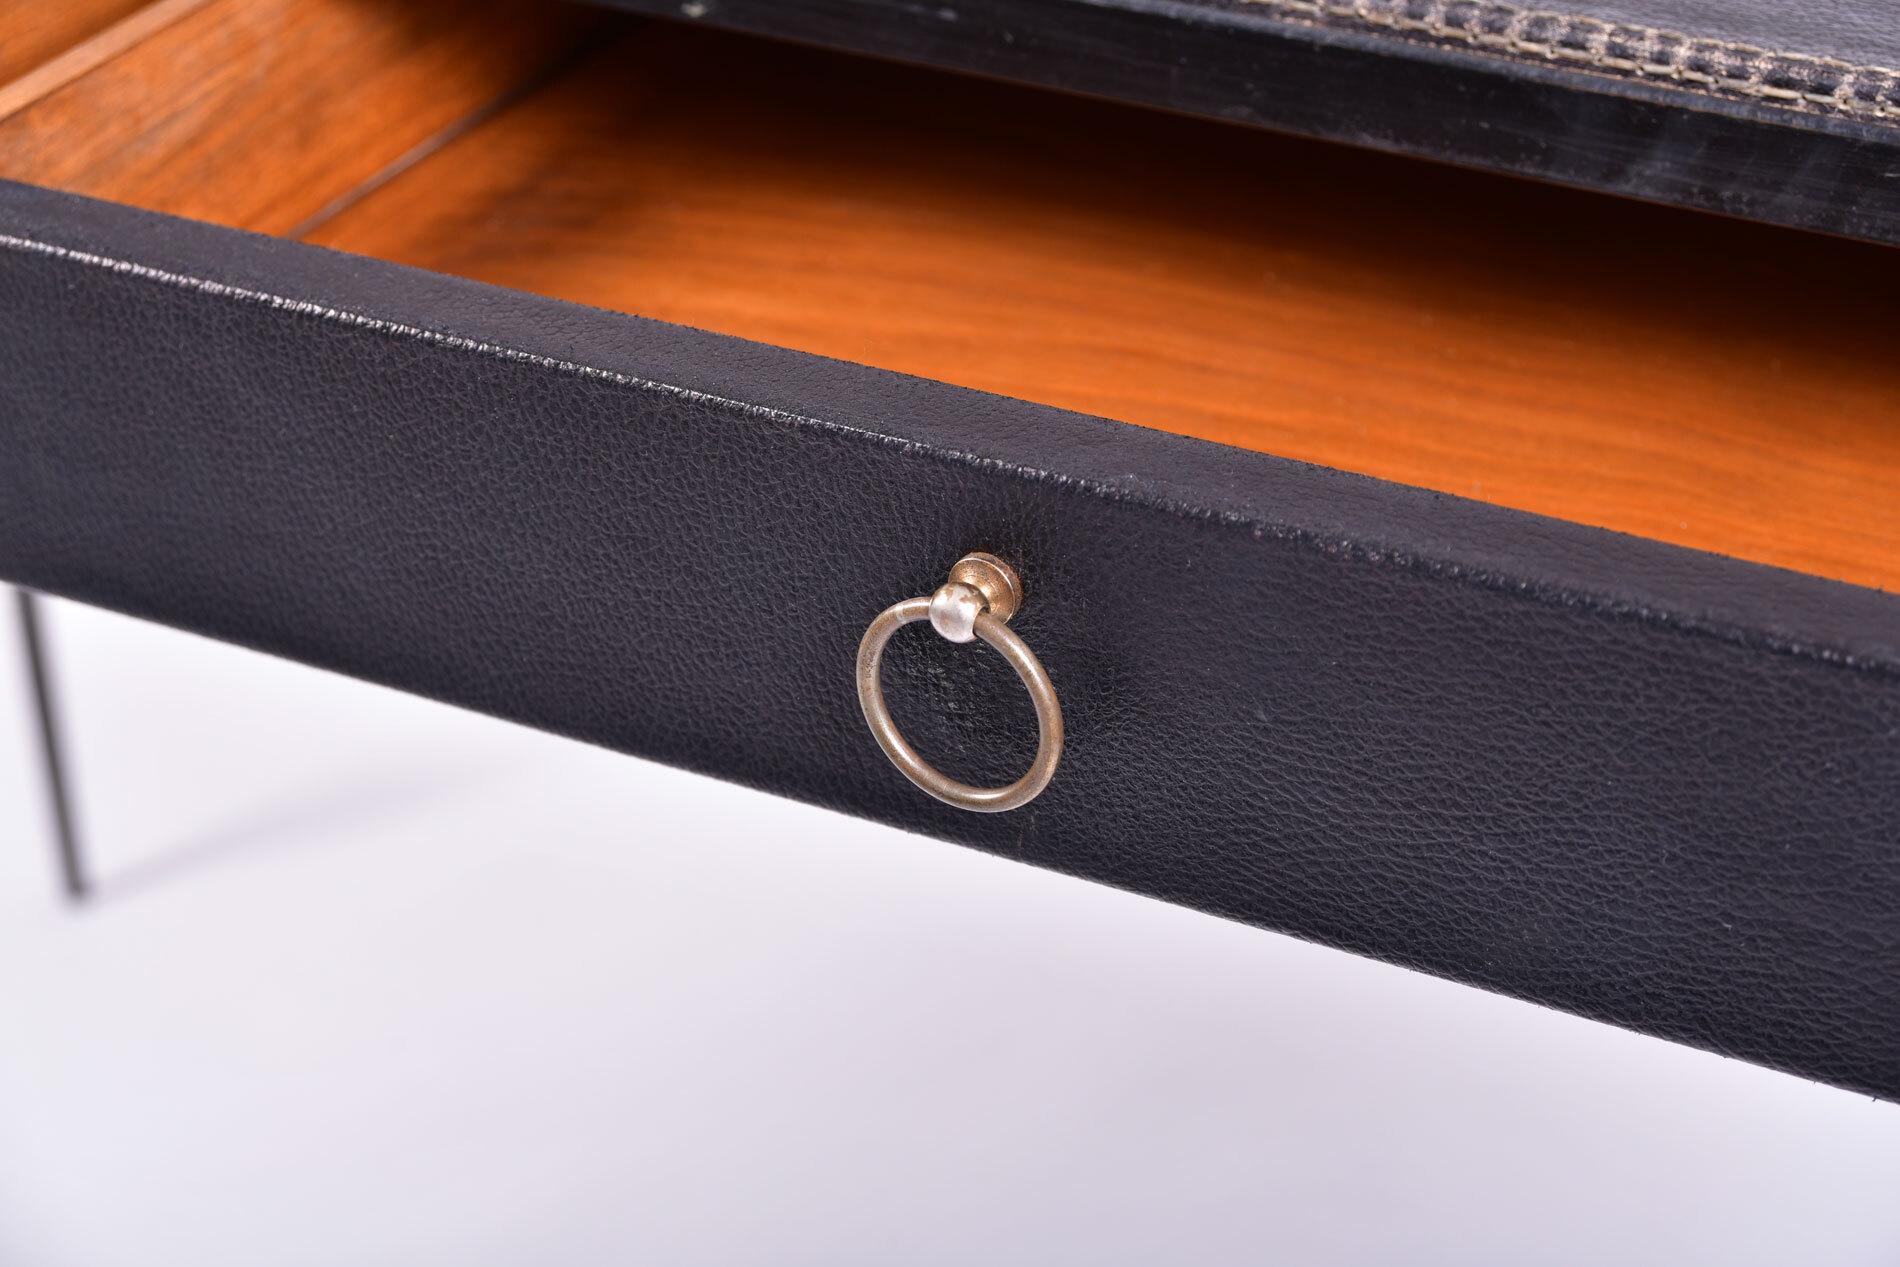 Jmf Leather Desk 10